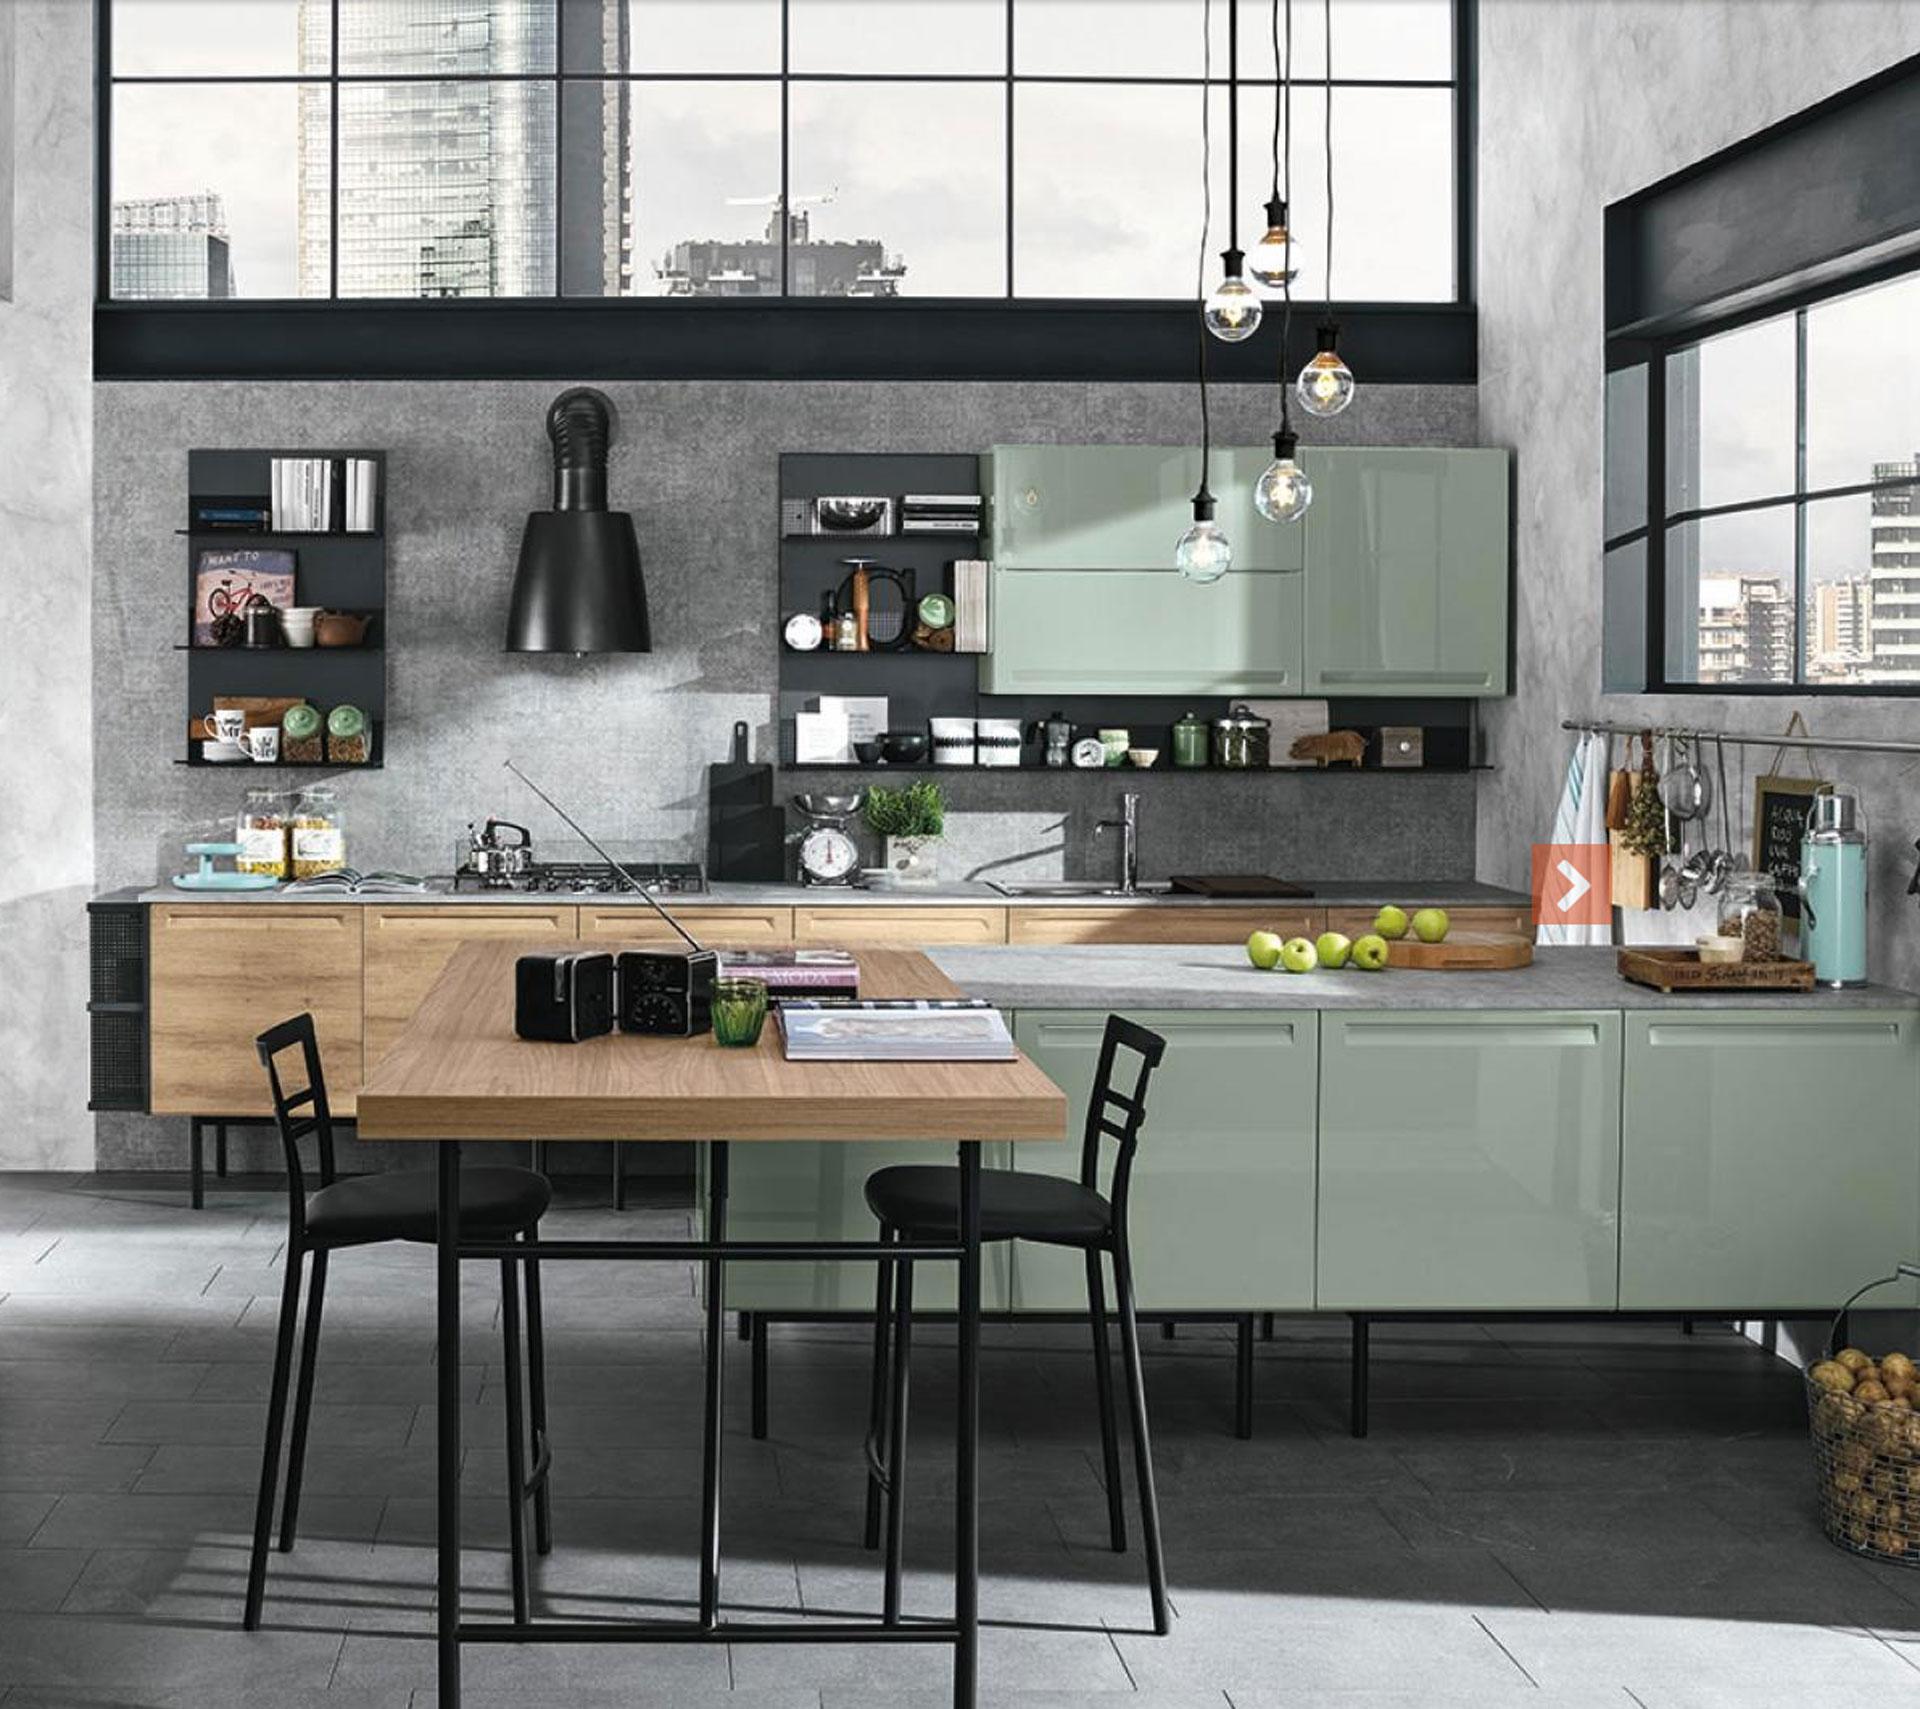 Mtm-arreda-gatteo-progettazione-su-misura-cucina